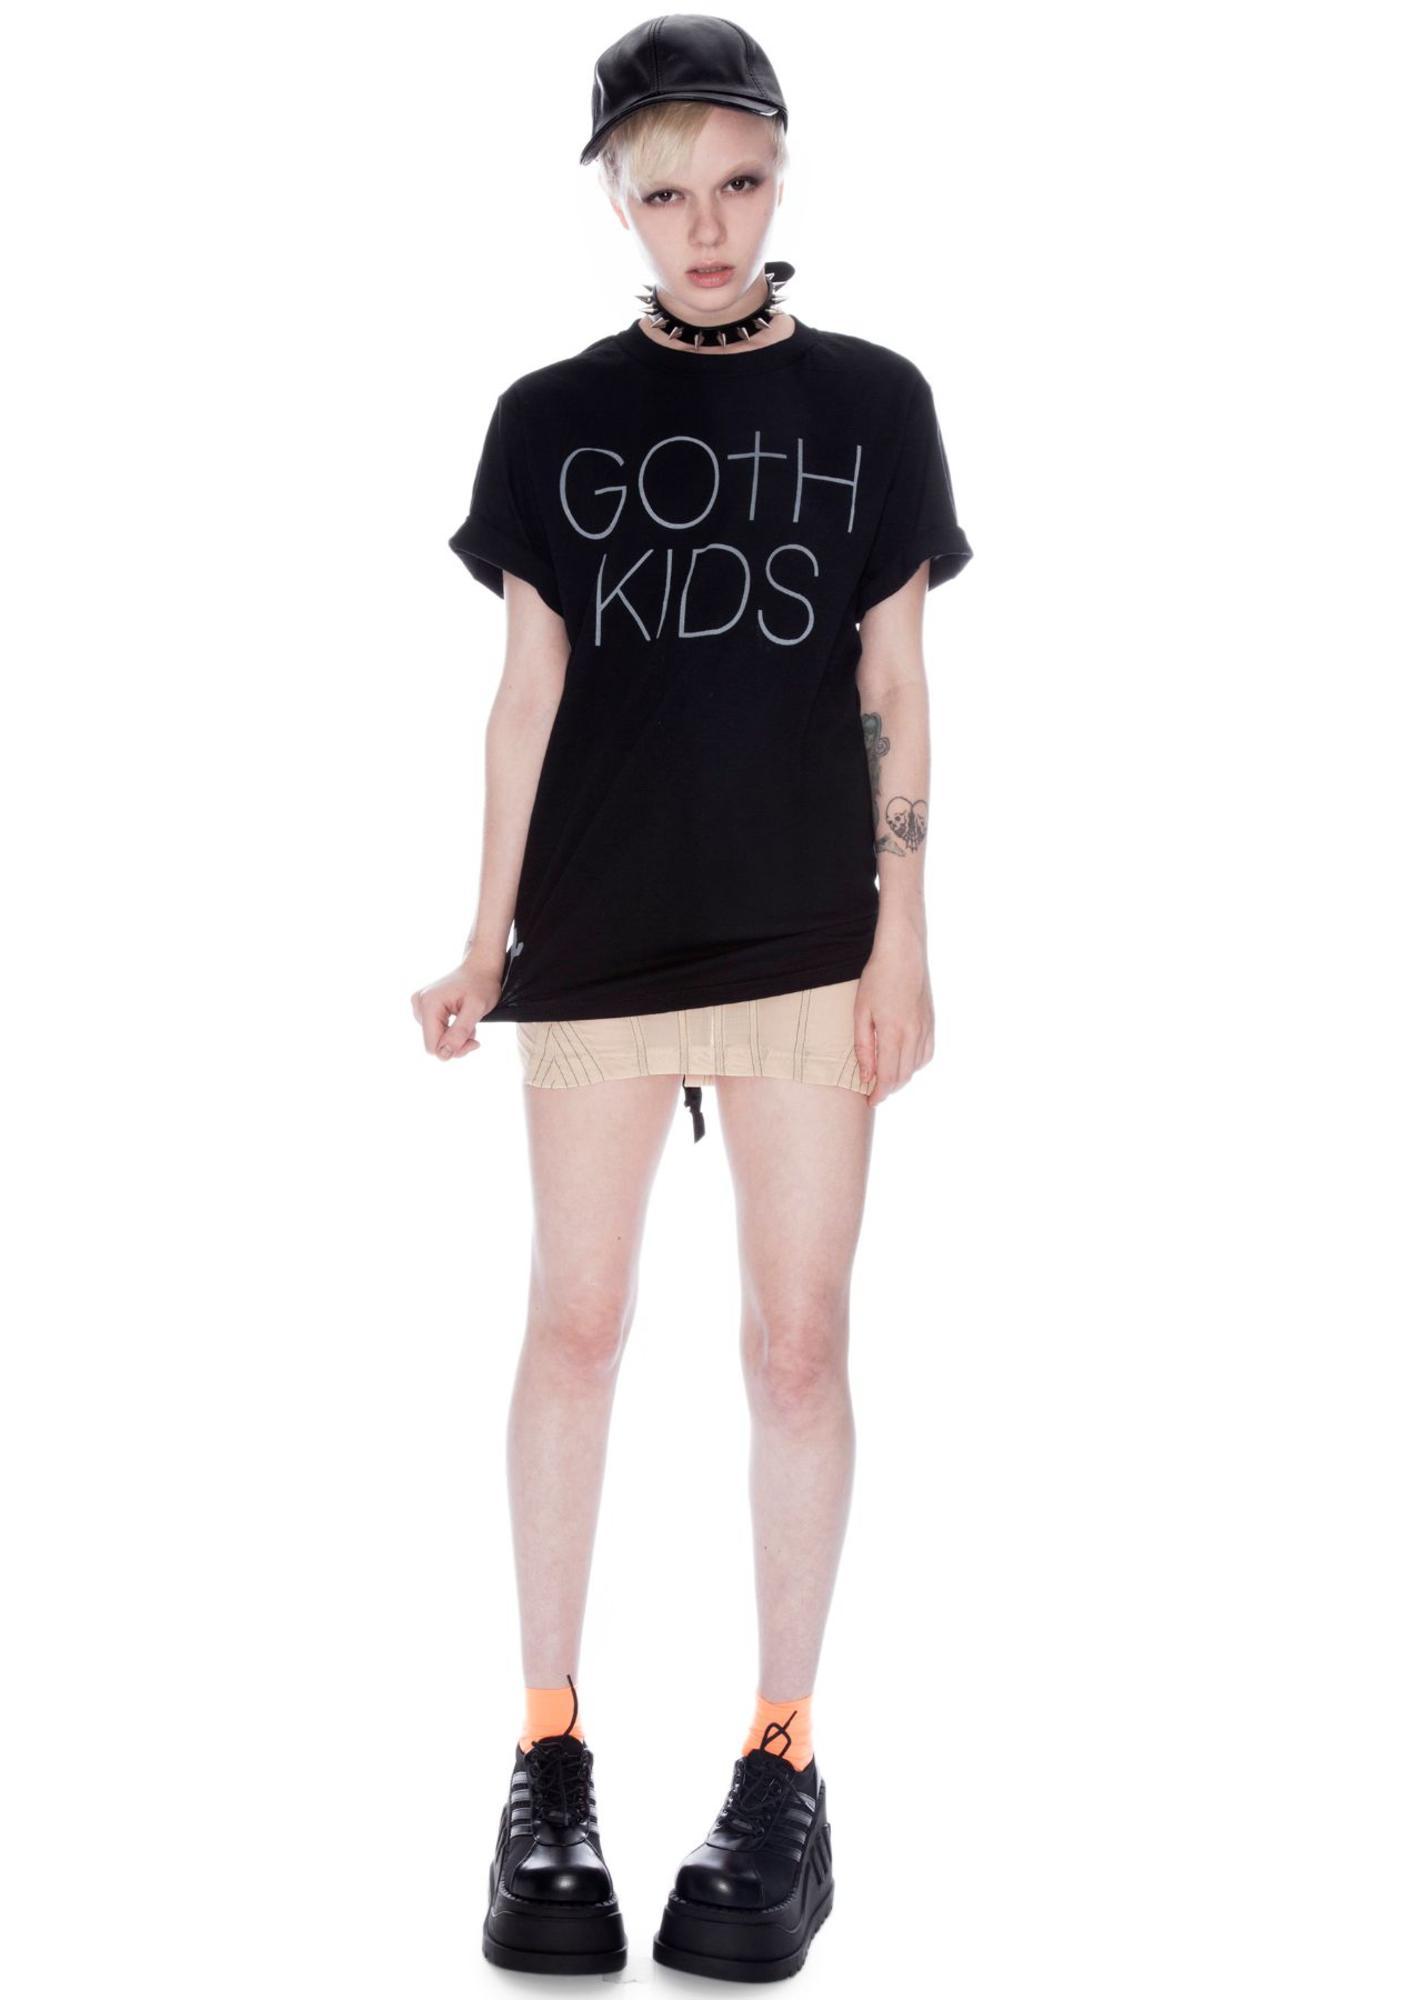 Goth Kids Tee